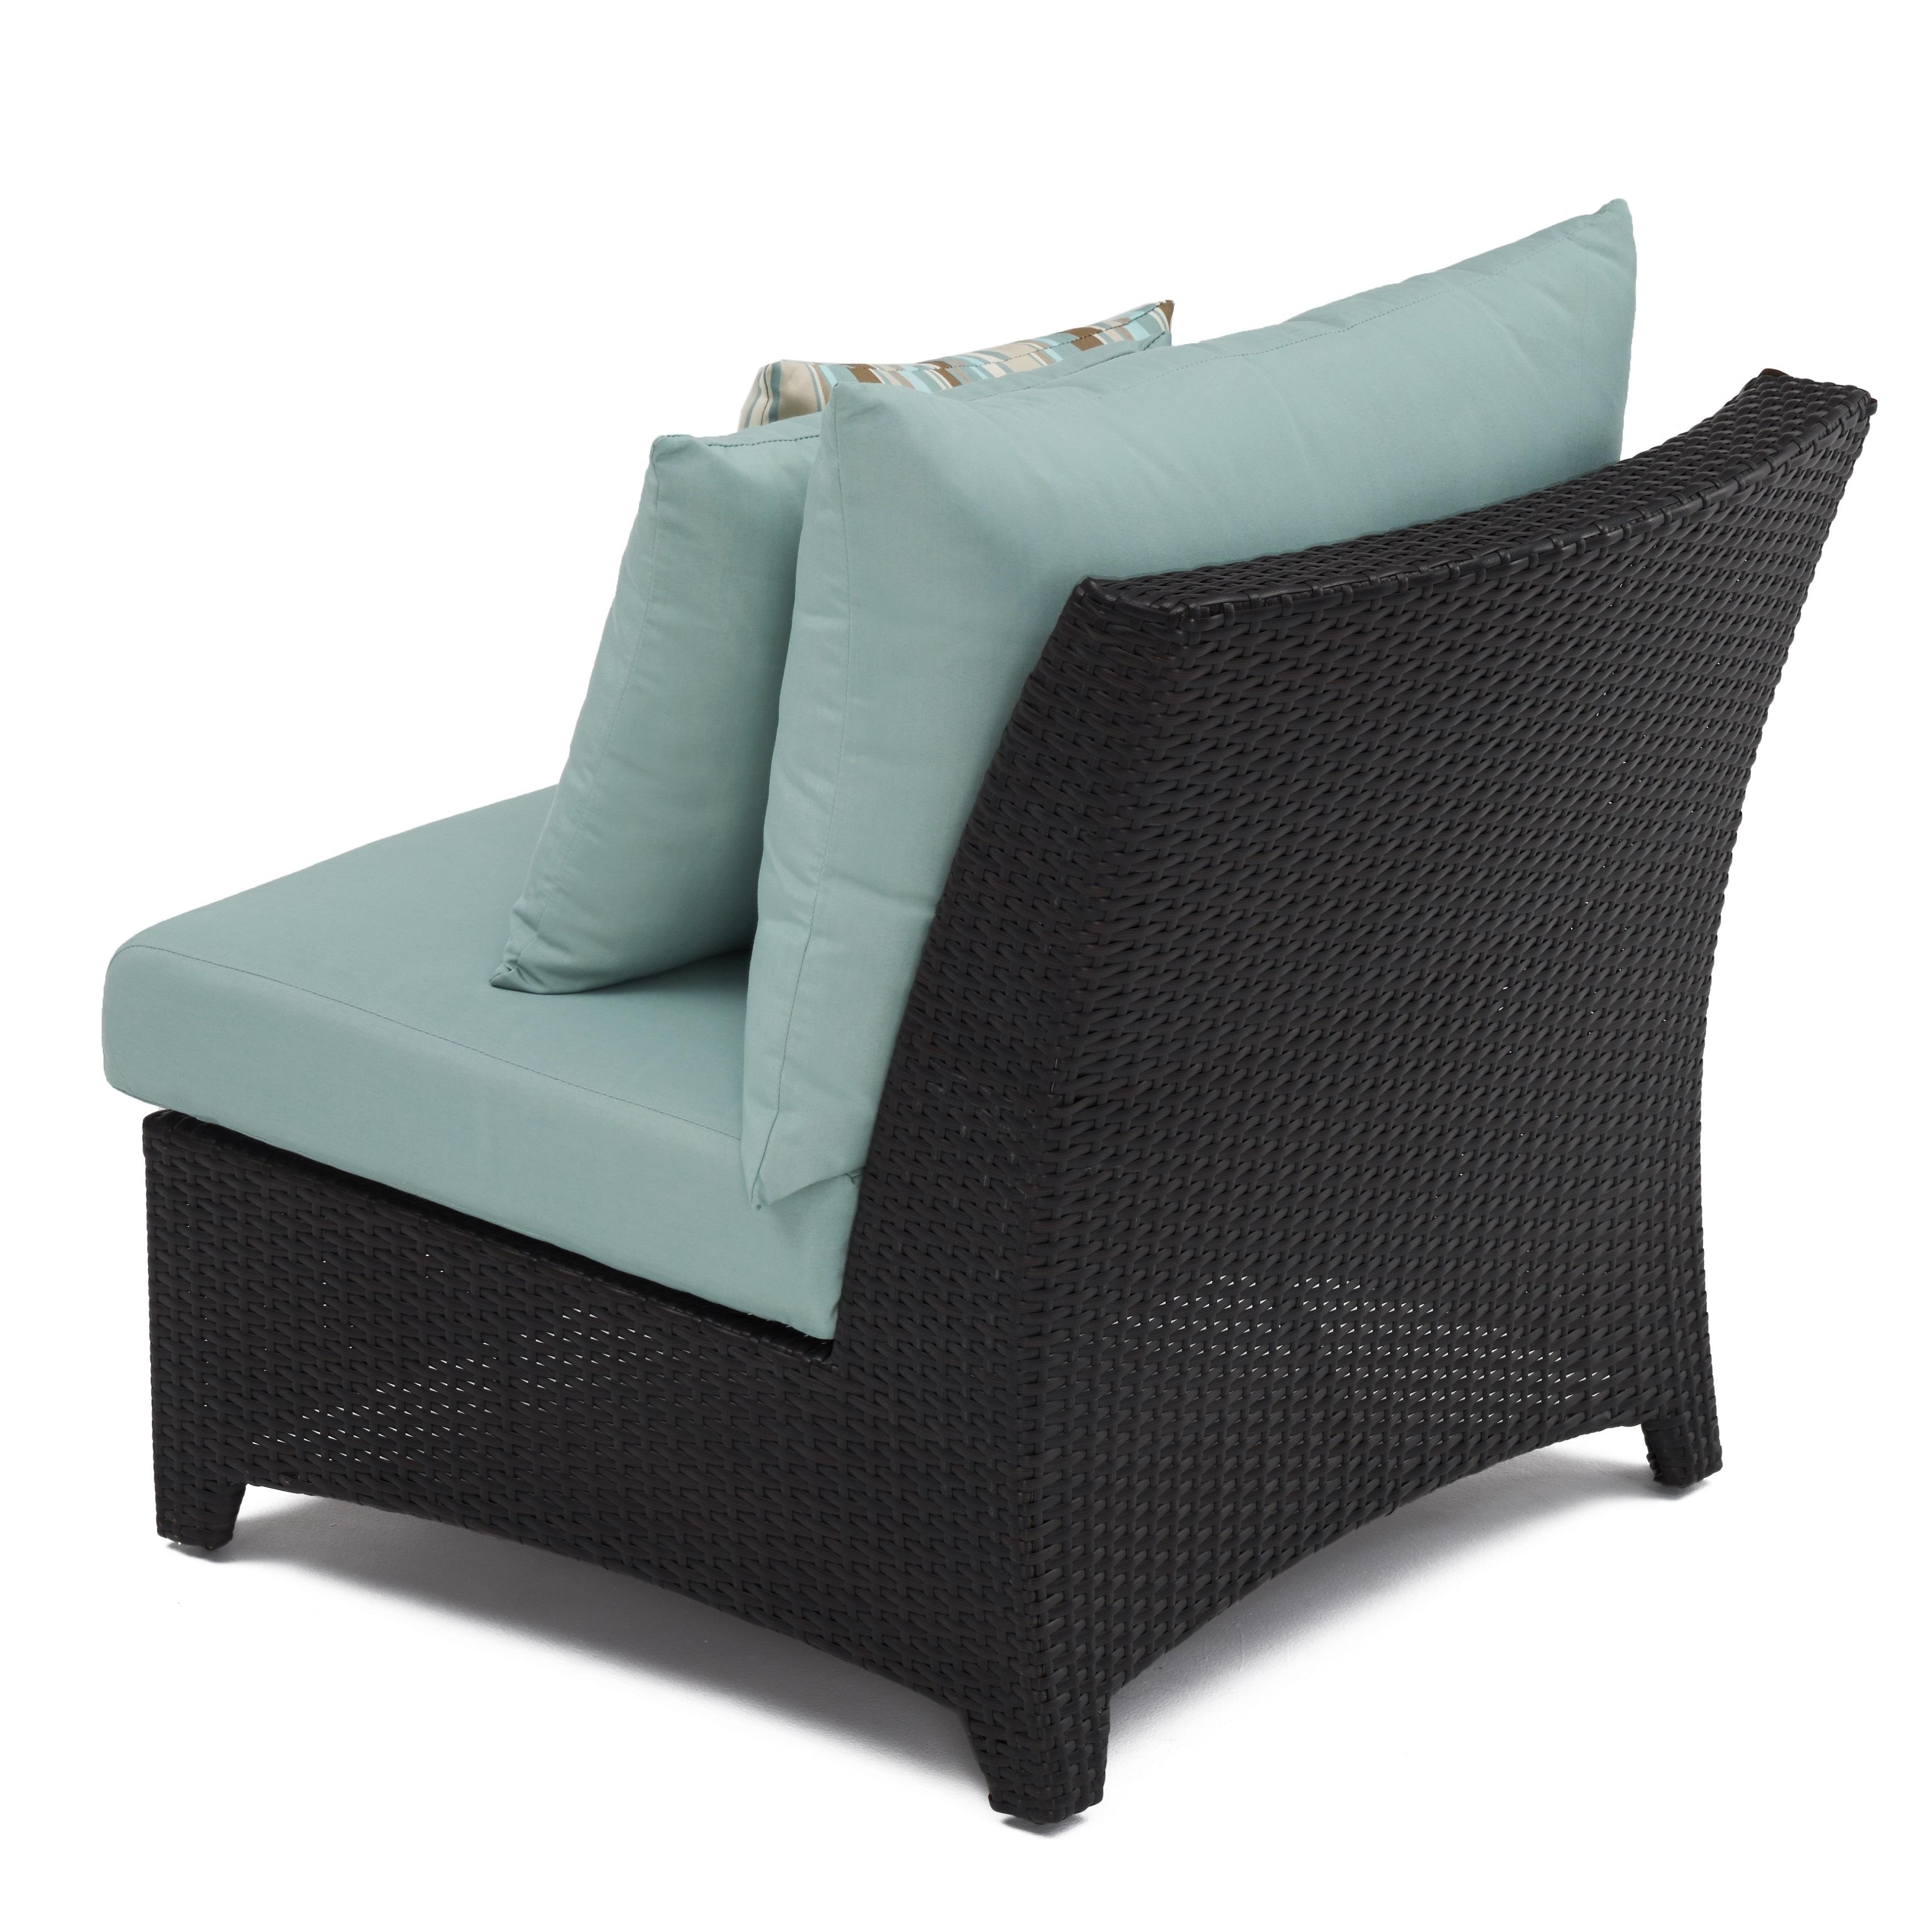 Bliss 6 Piece Corner Sectional Sofa